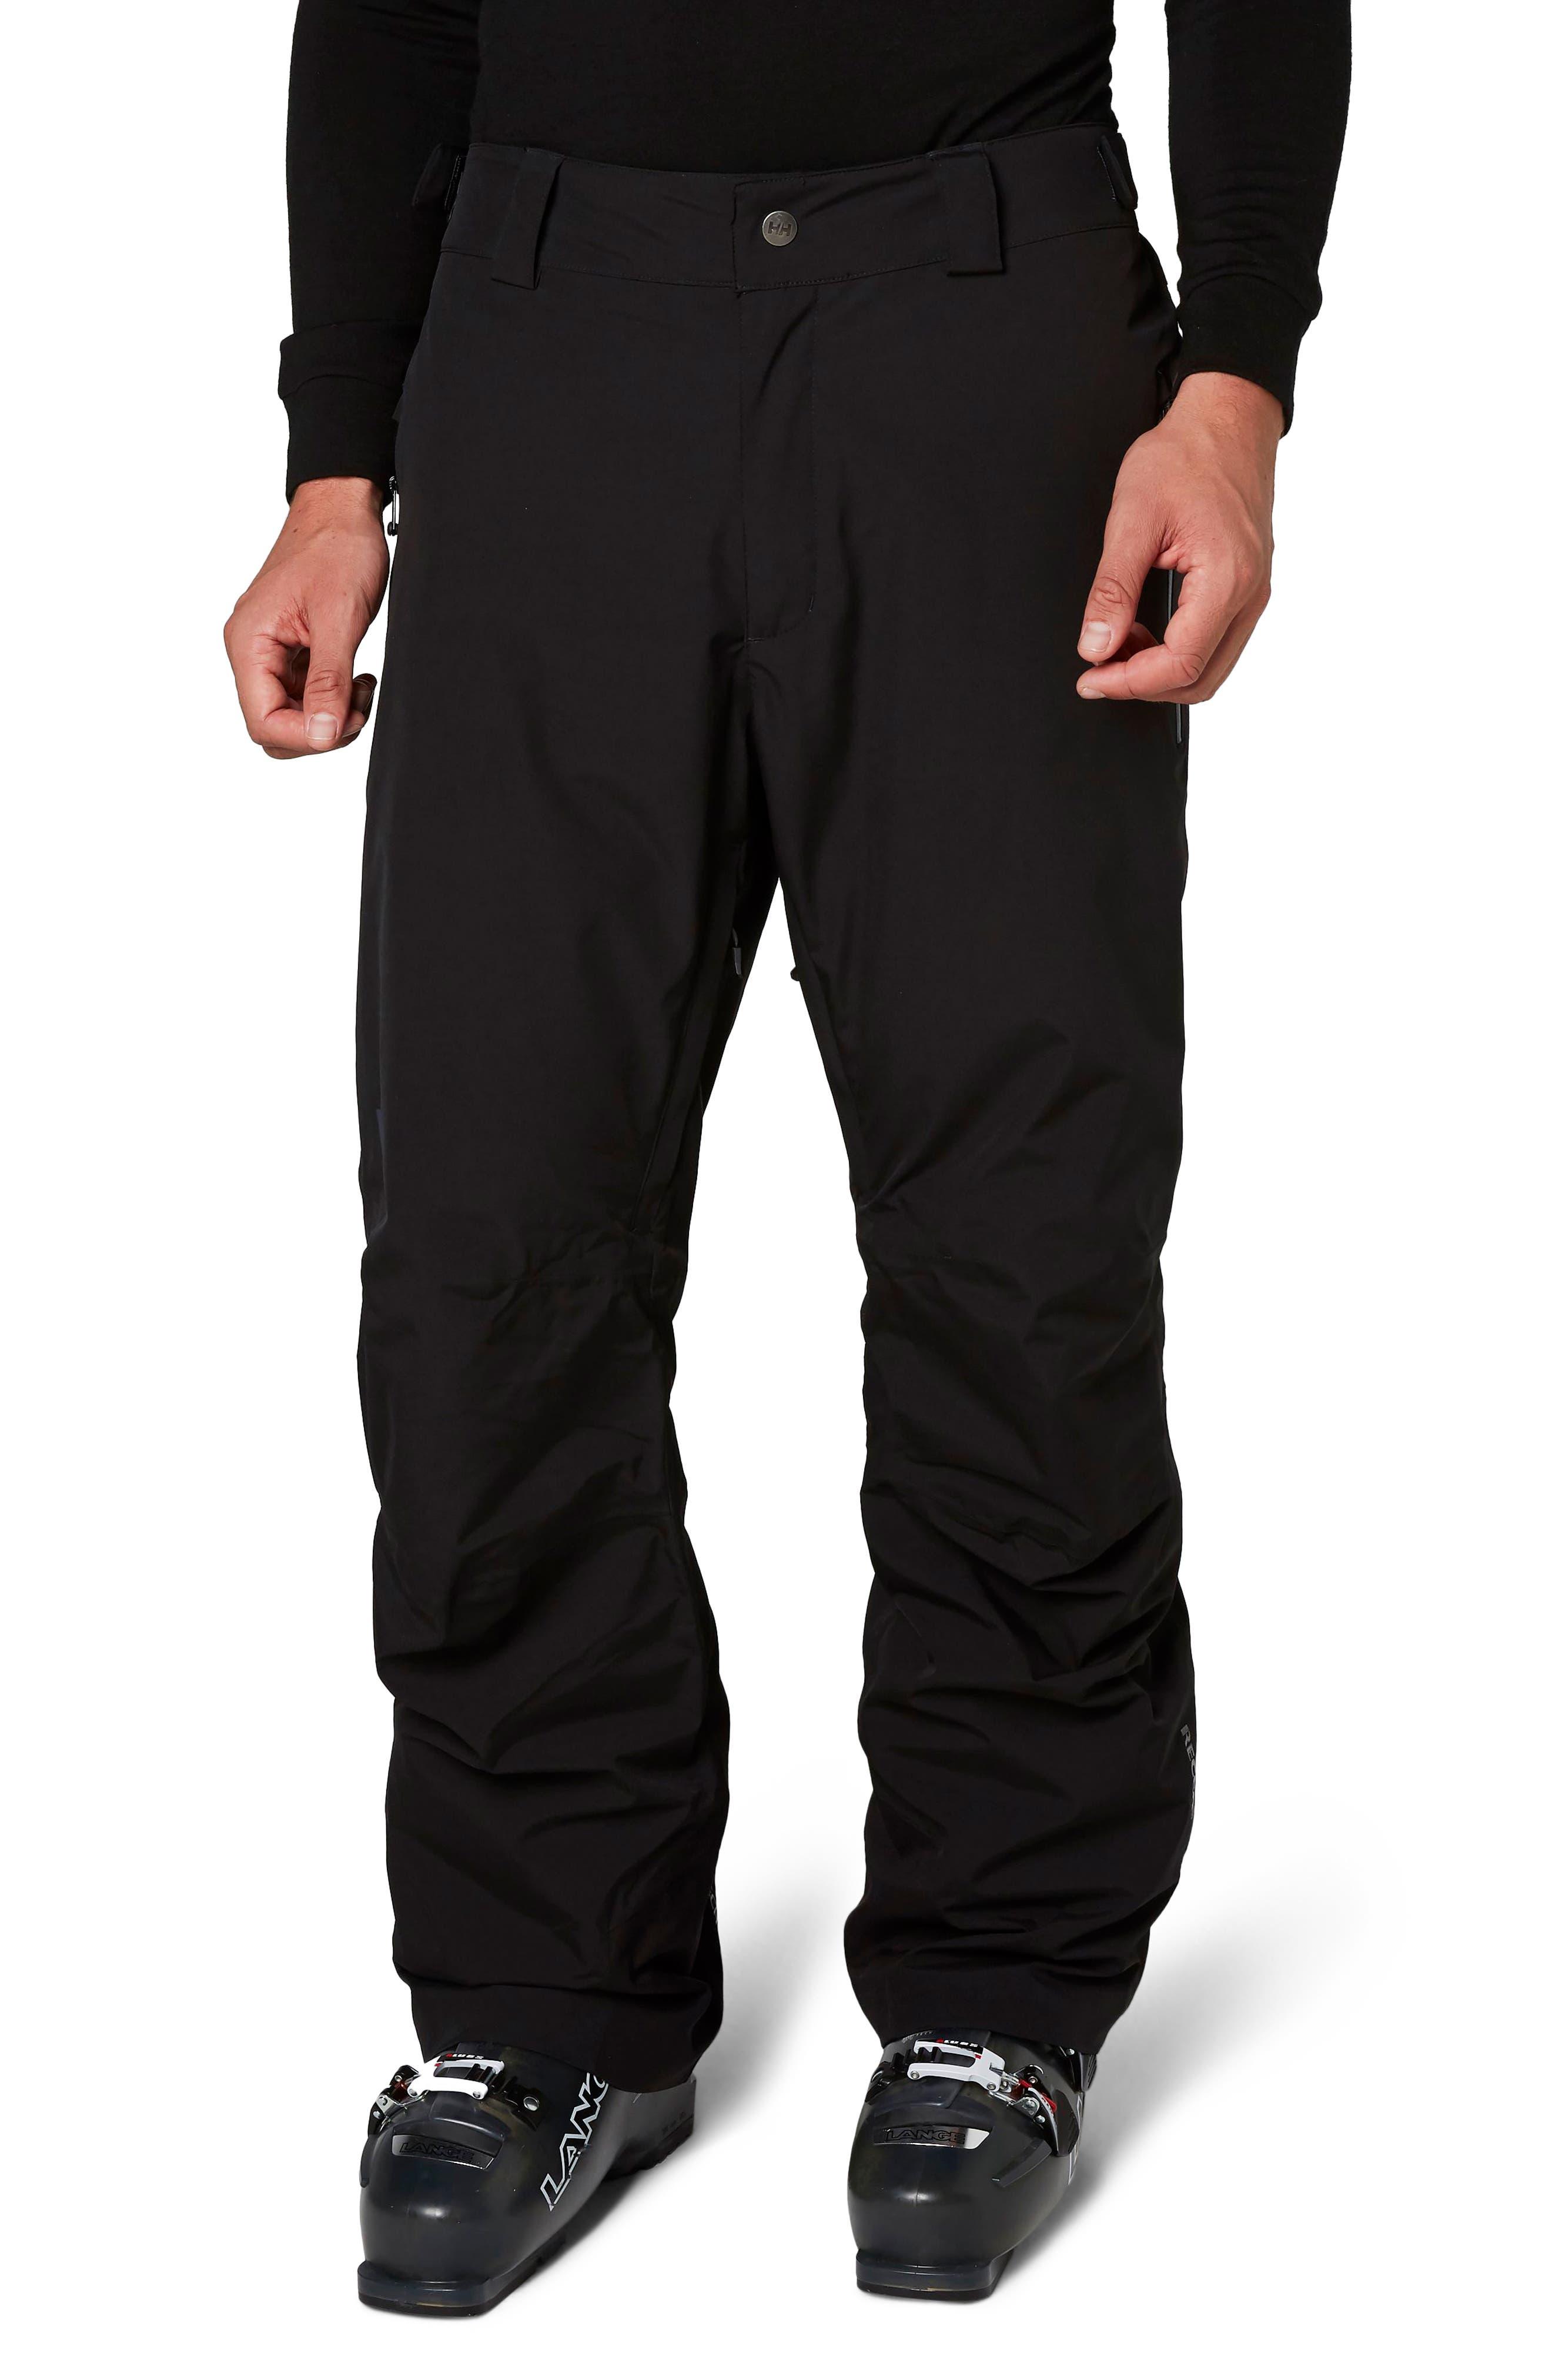 Helly Hansen Legendary - Short Waterproof PrimaLoft Insulated Snow Pants